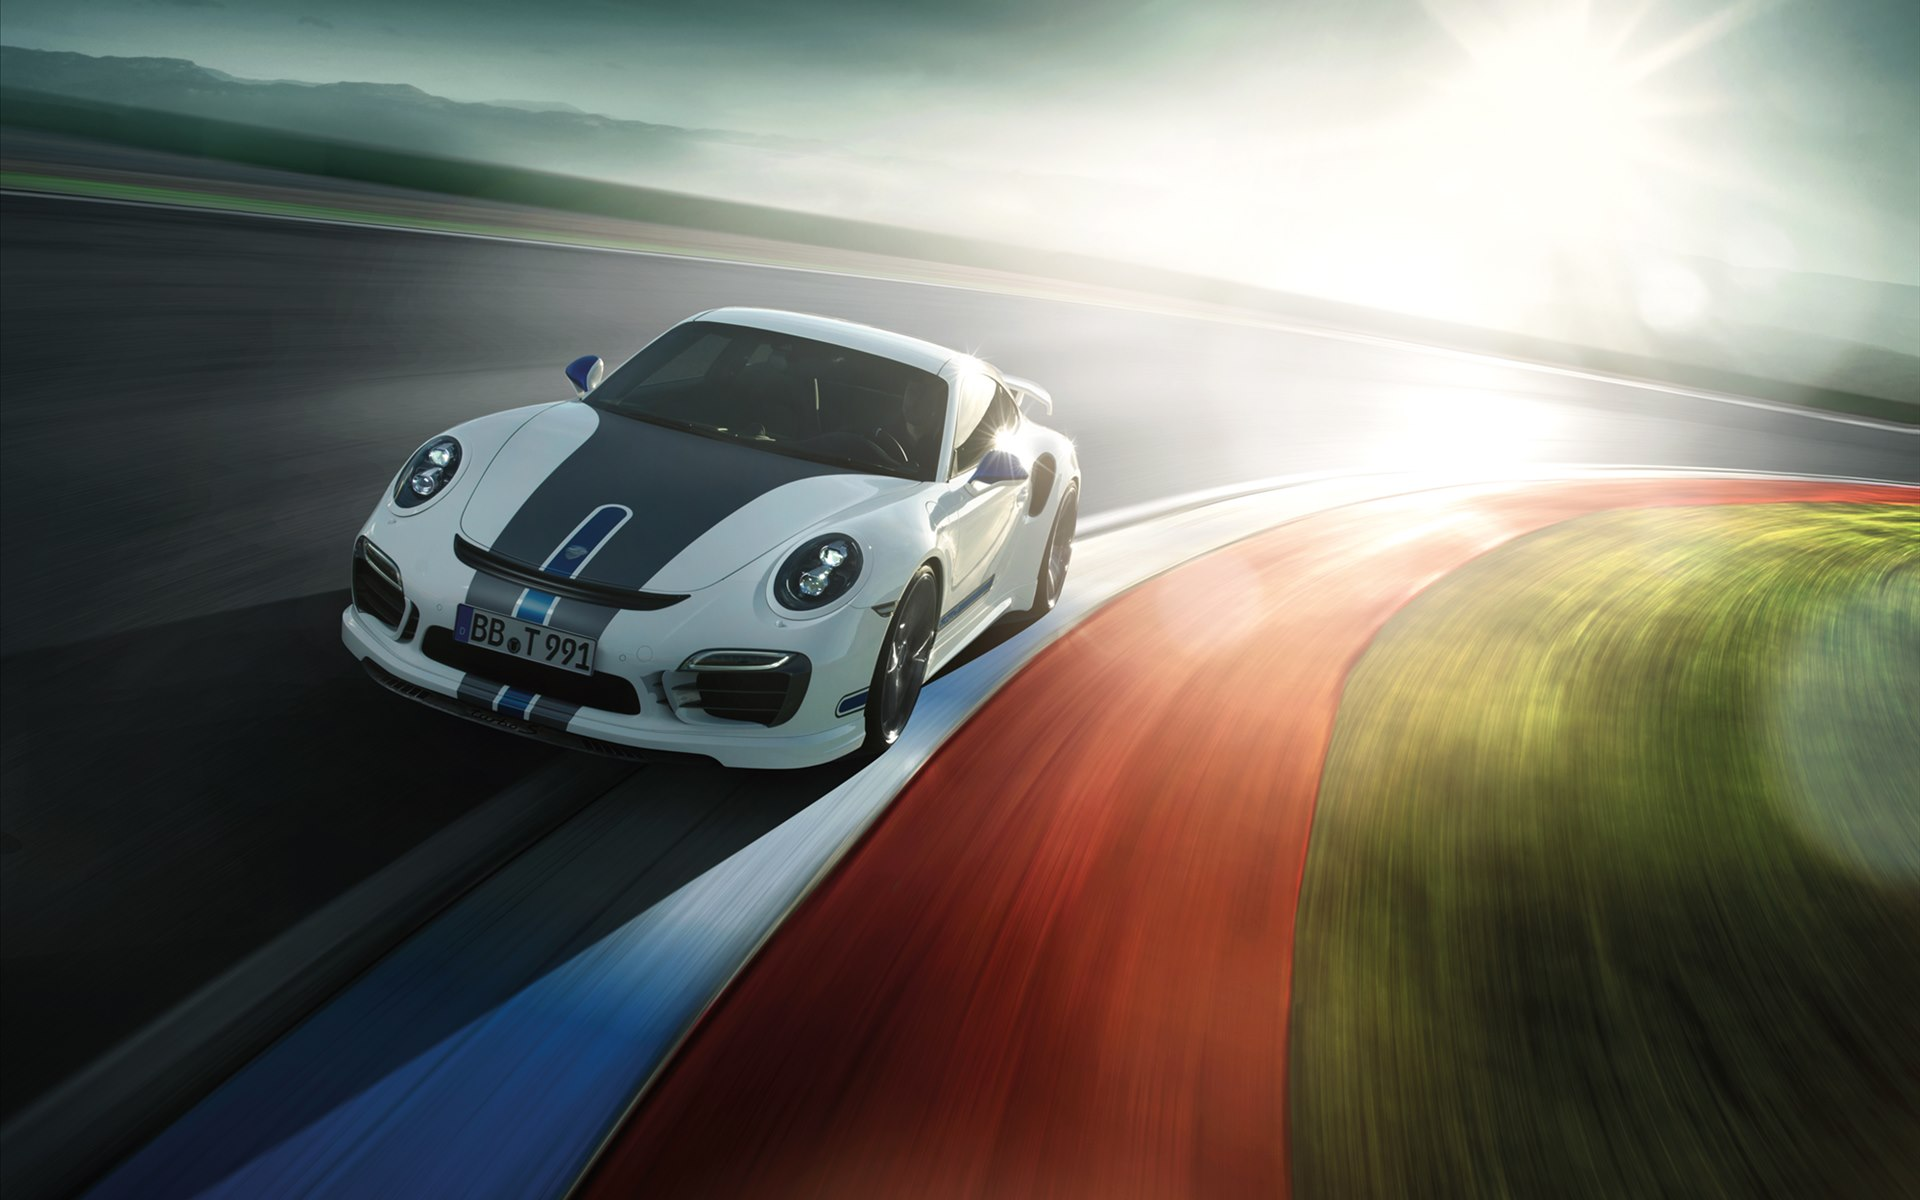 2014 Techart Porsche 911 Turbo S Wallpaper Hd Car Wallpapers Id 4669